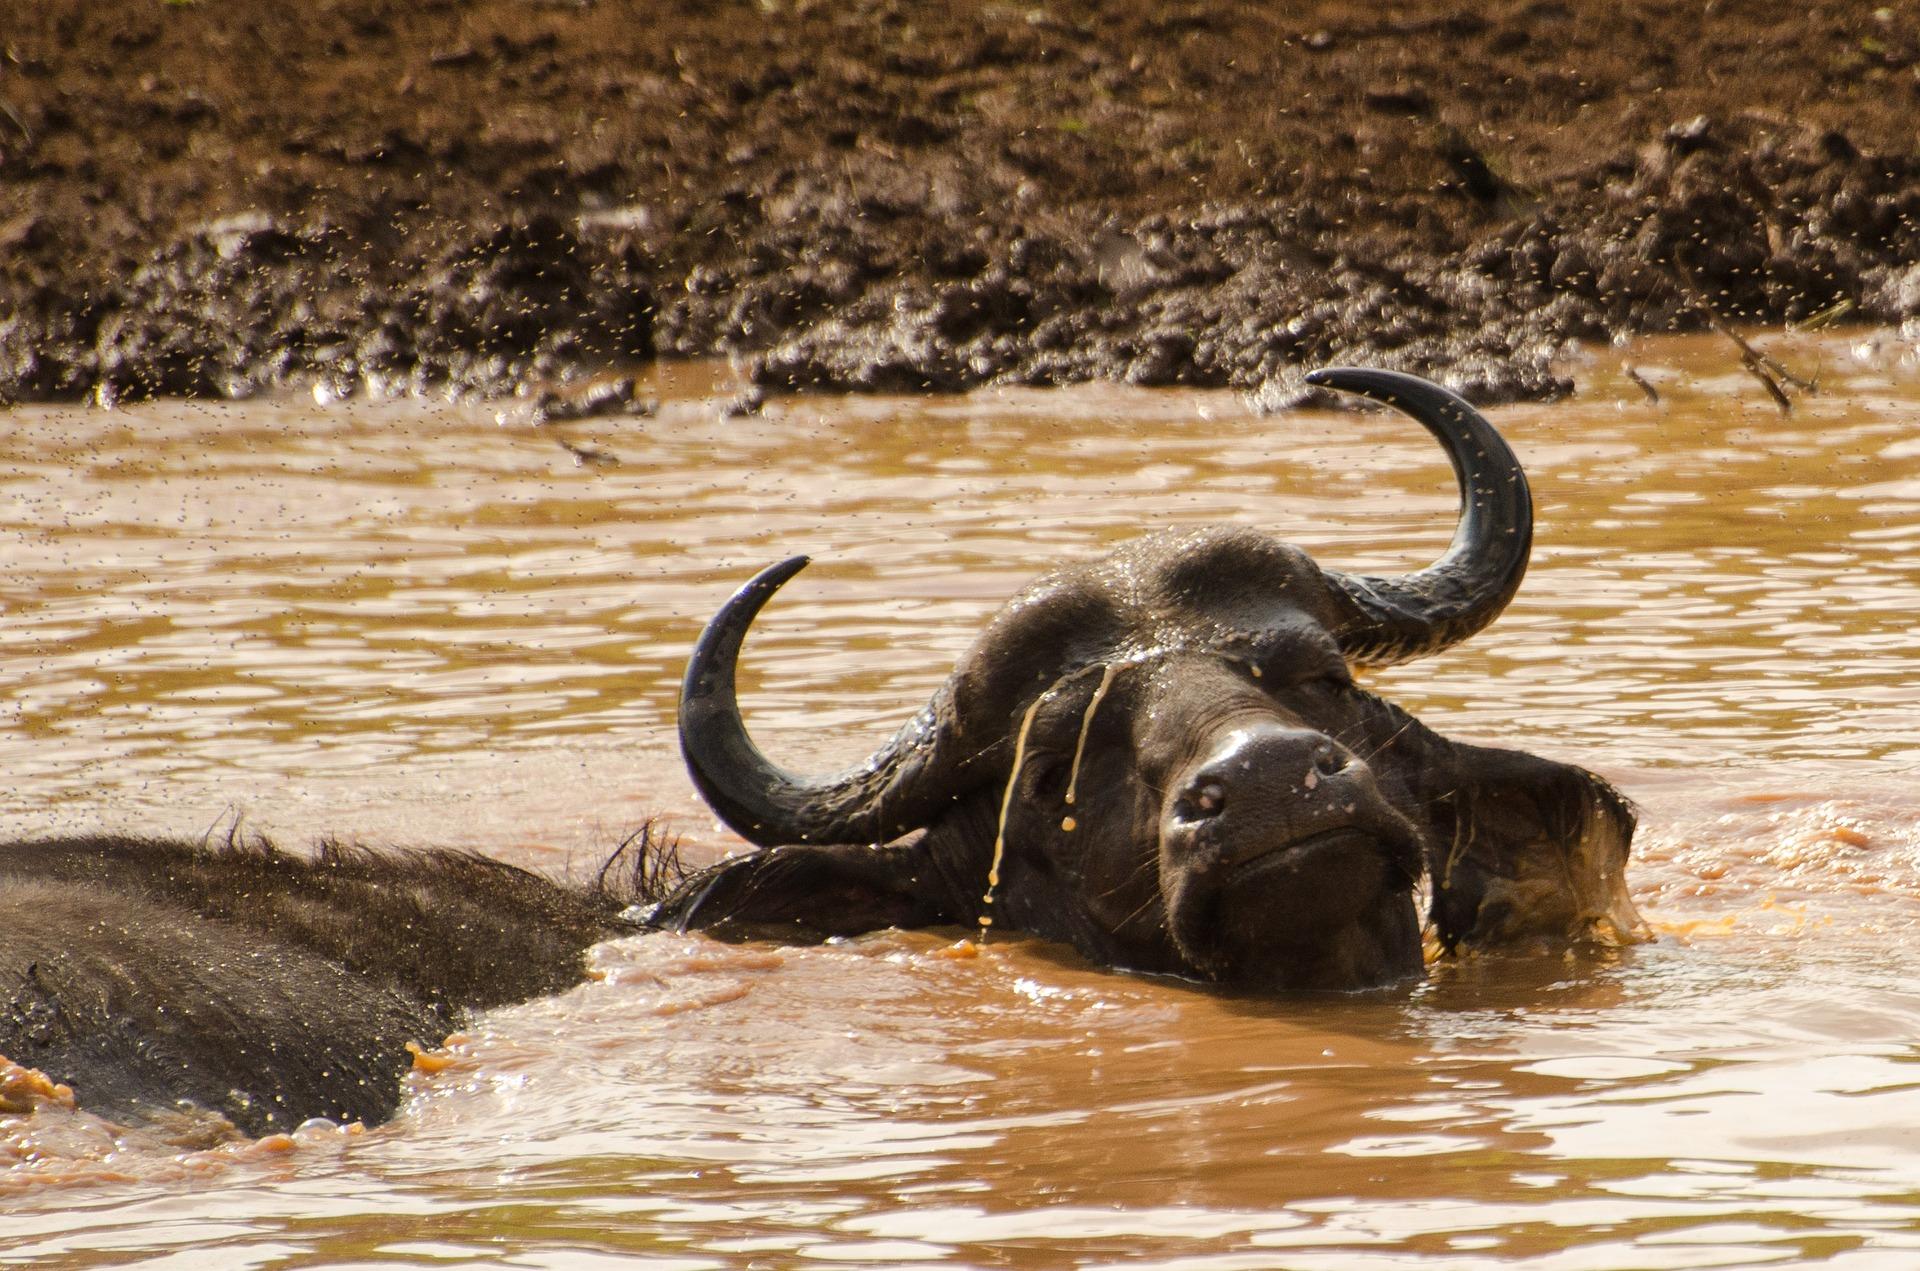 buffalo-2359970_1920